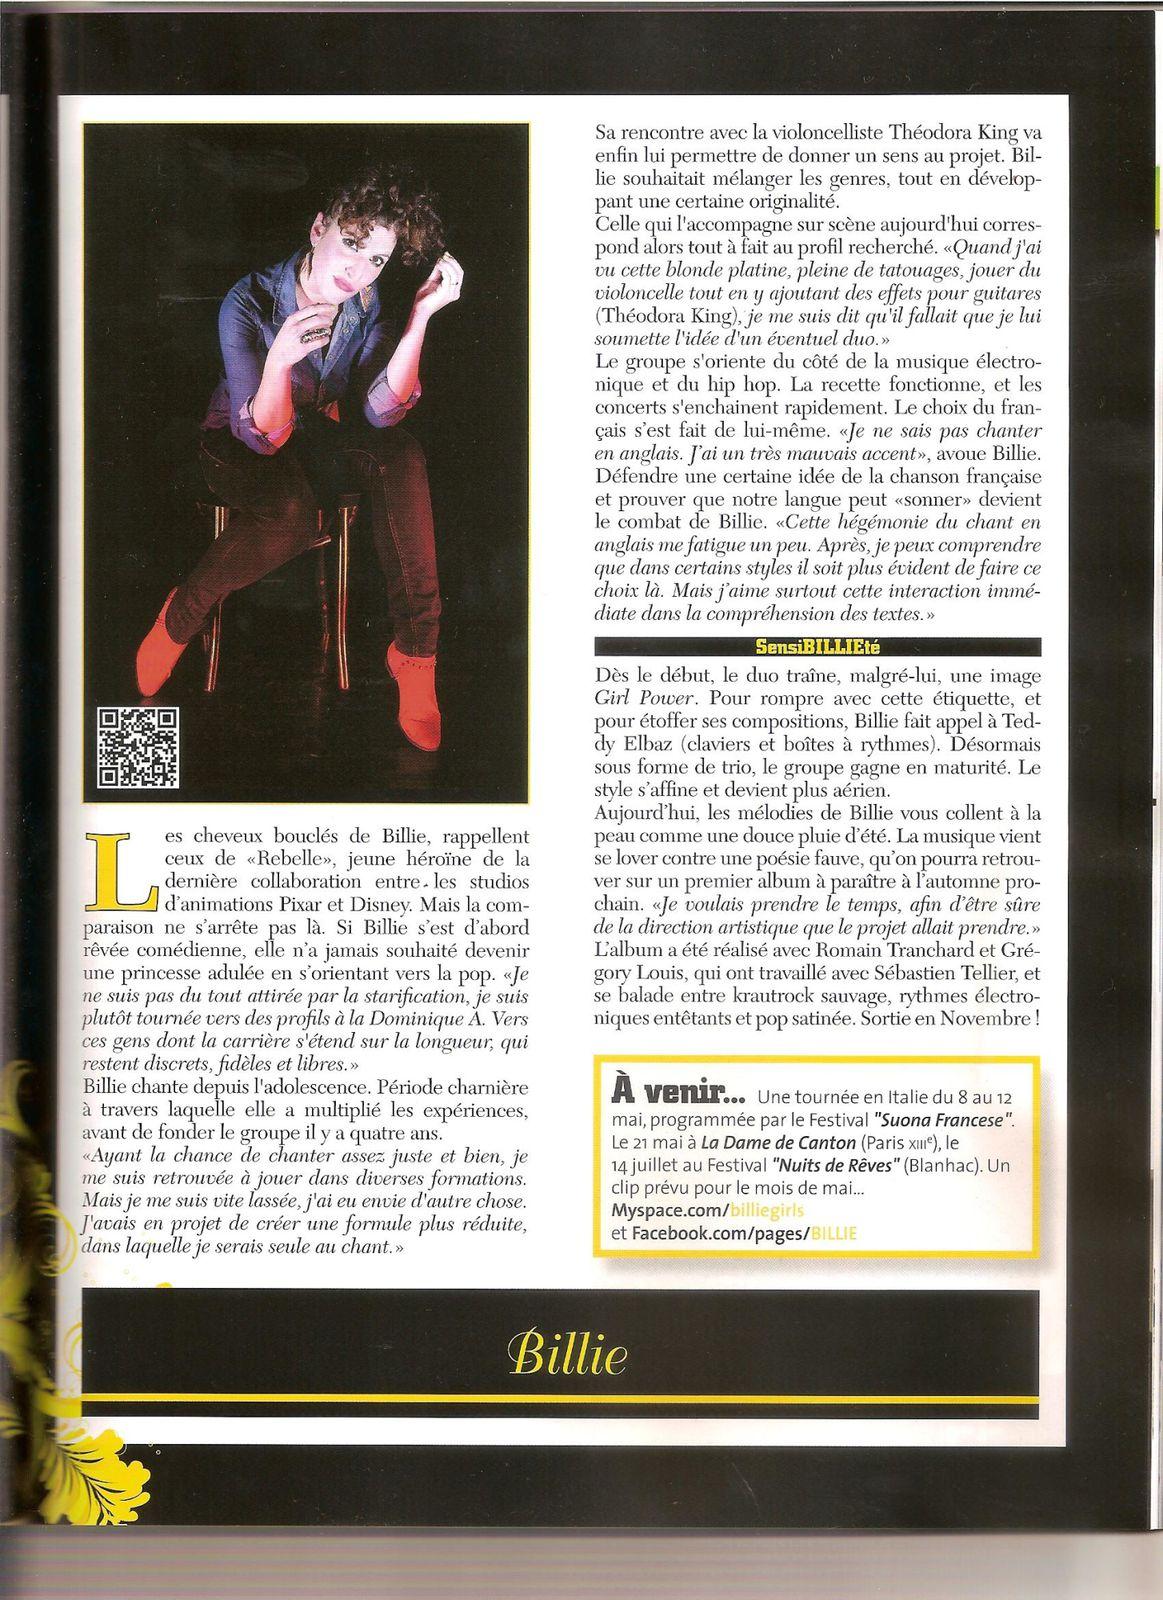 Billie : Le Feminin